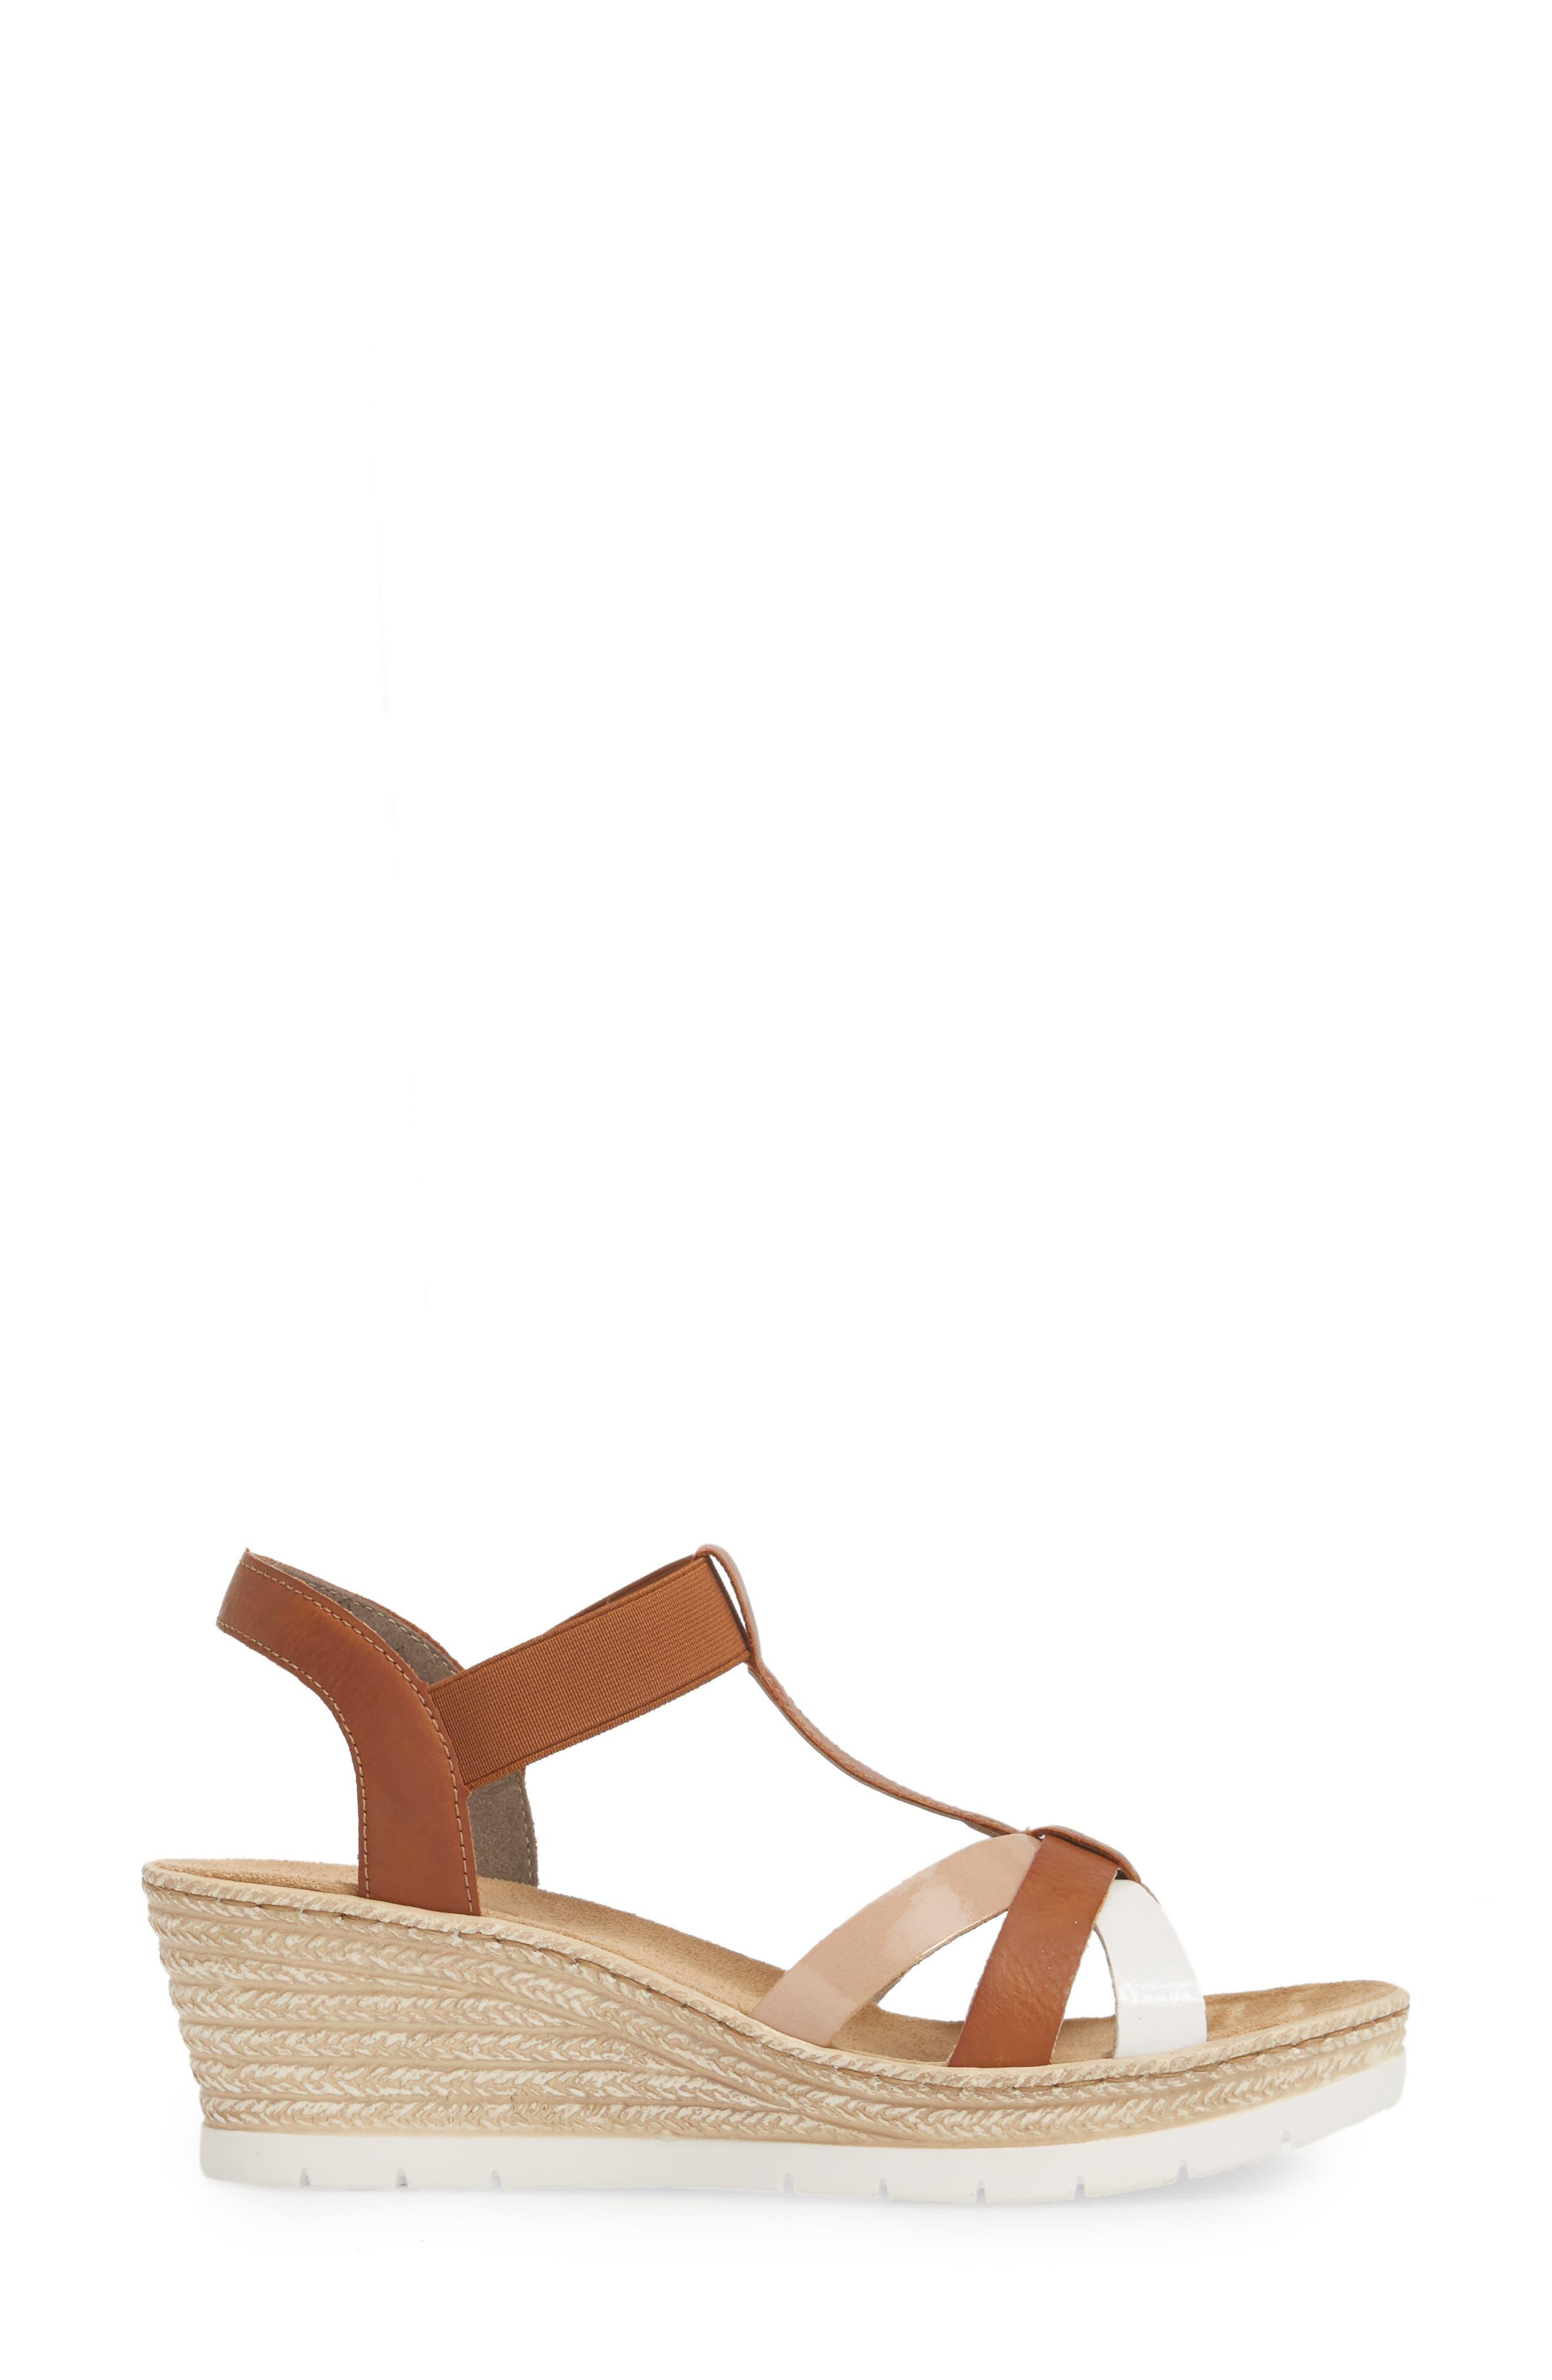 RIEKER ANTISTRESS,                             Fanni 95 Espadrille Wedge Sandal,                             Alternate thumbnail 3, color,                             BIANCO/ CAYENNE